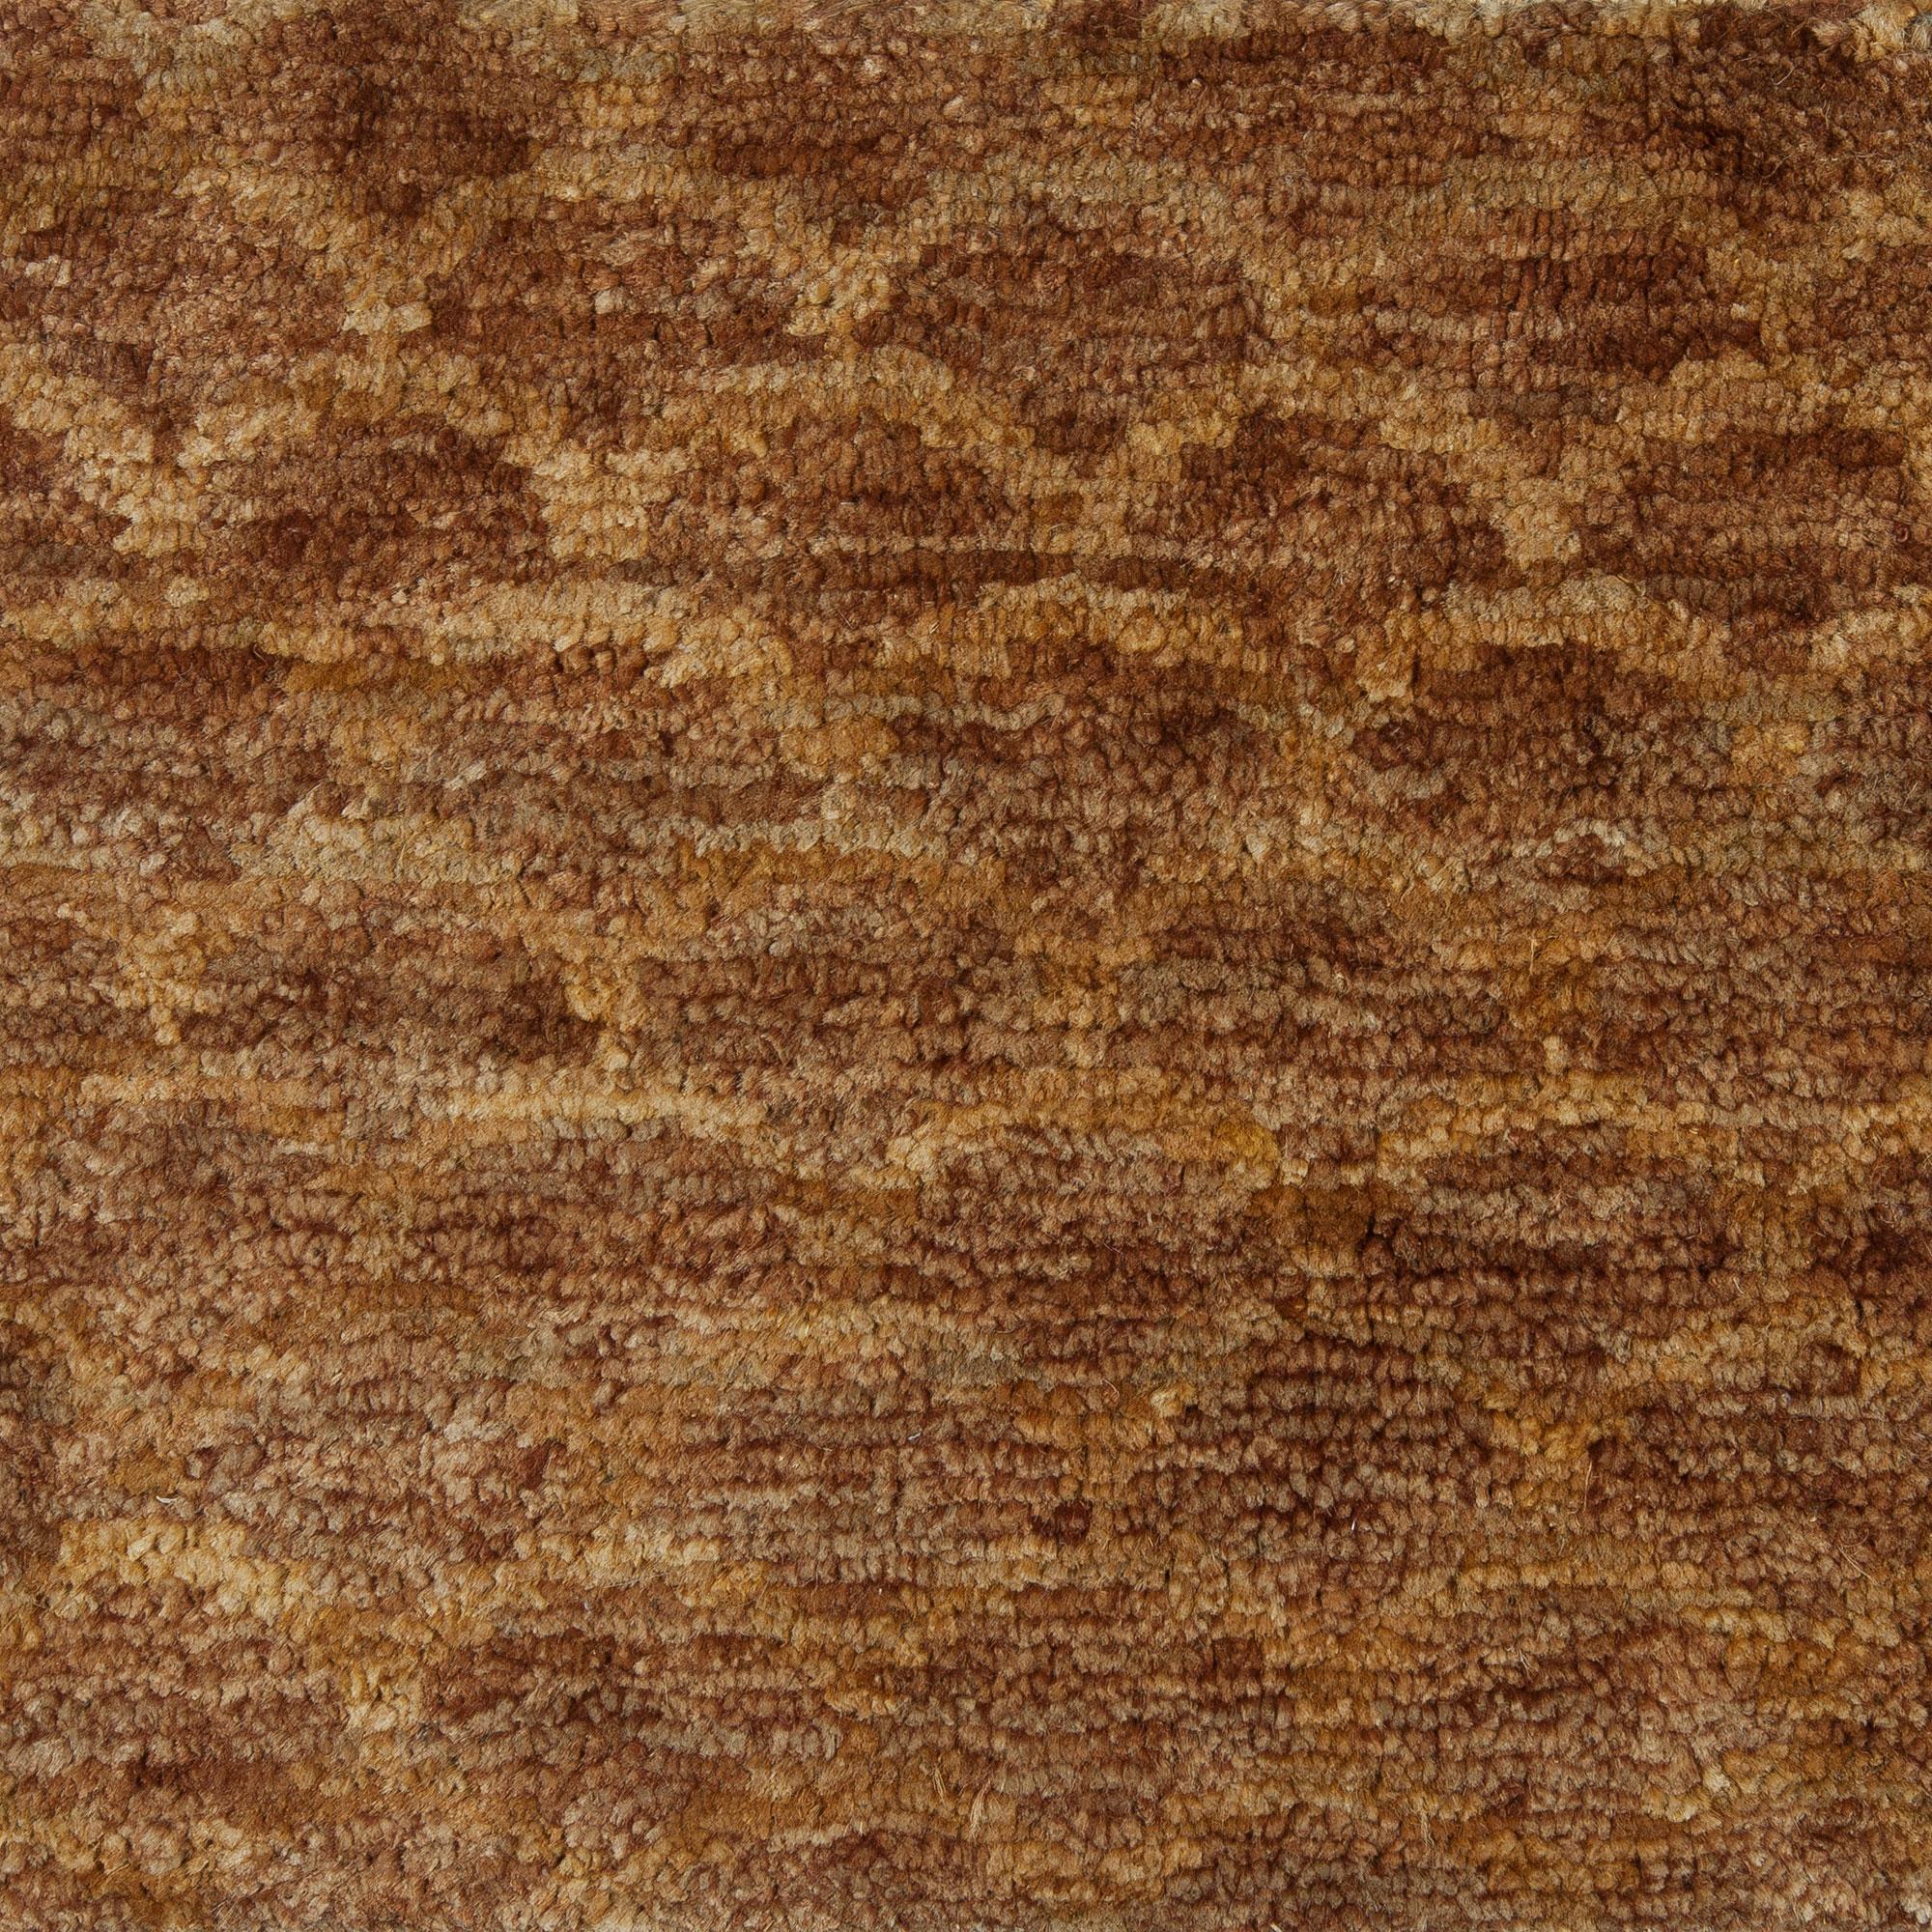 Tweed Custom Rug Design S11618 S11618